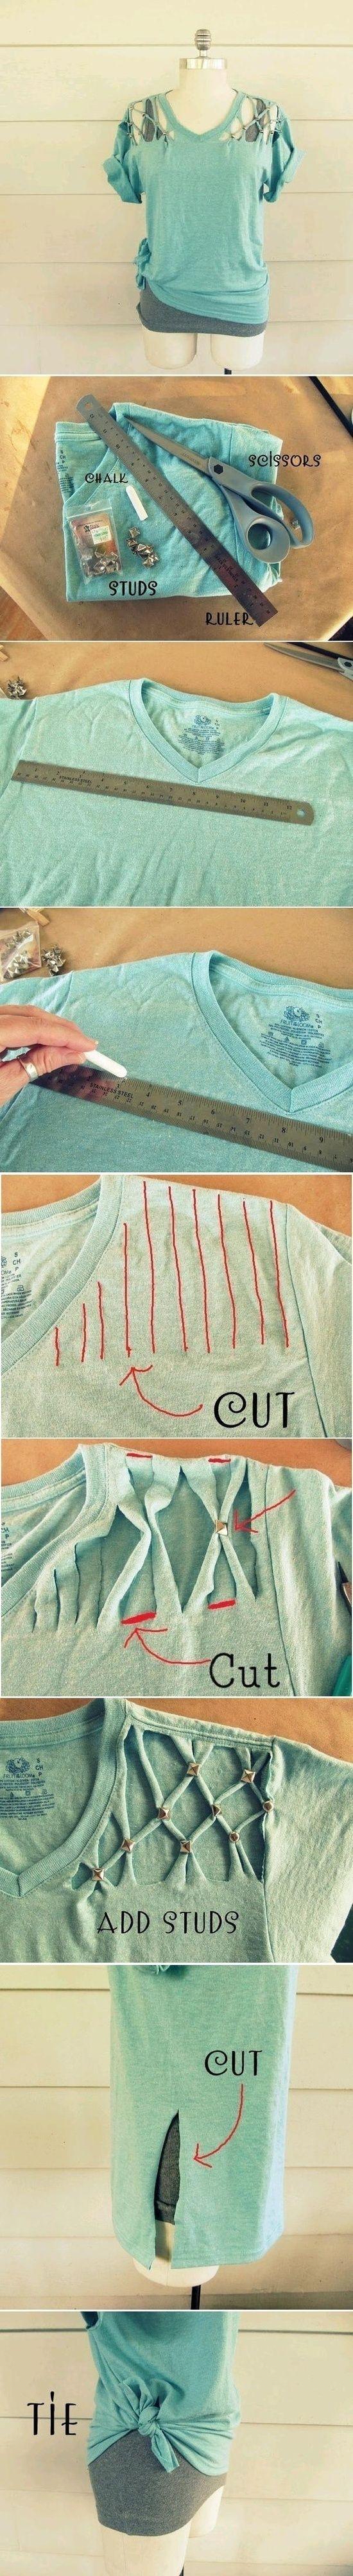 DIY Cool Studded T Shirt